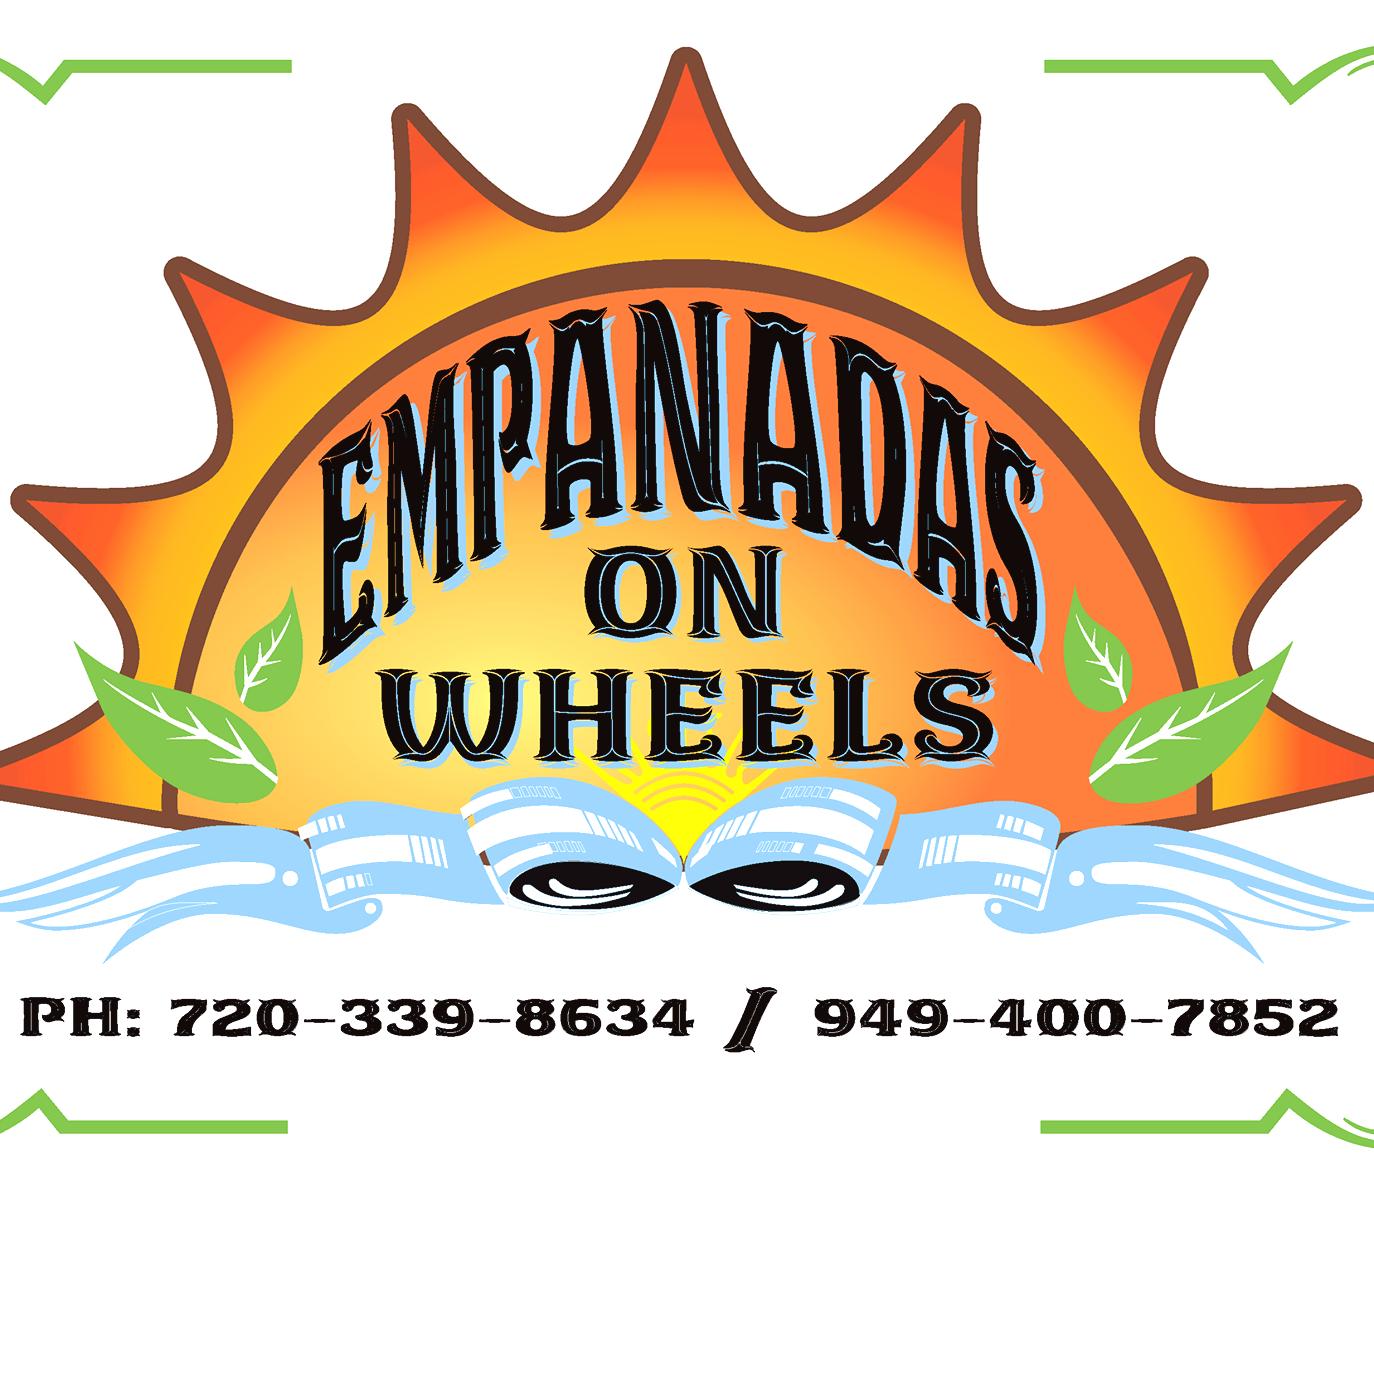 Empanadas on Wheels logo